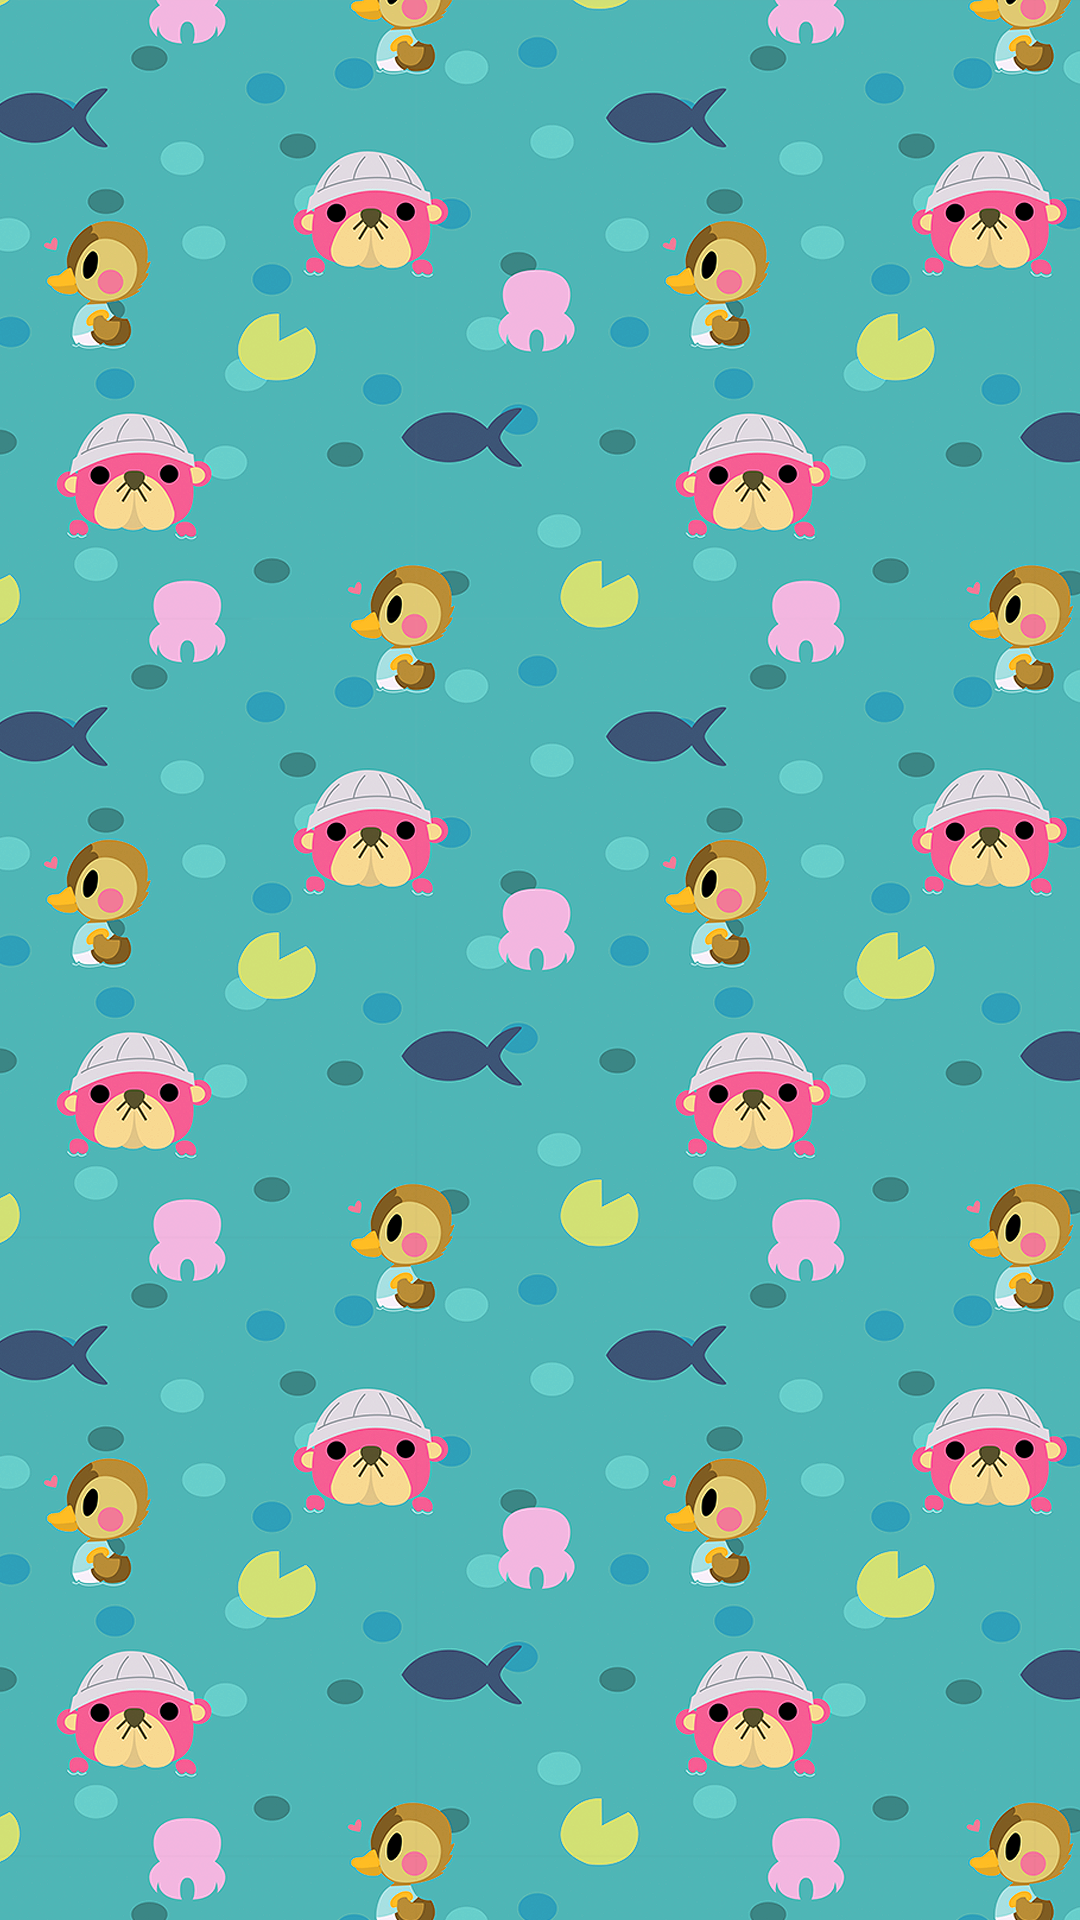 Animal Crossing Wallpapers - Top Free Animal Crossing ...